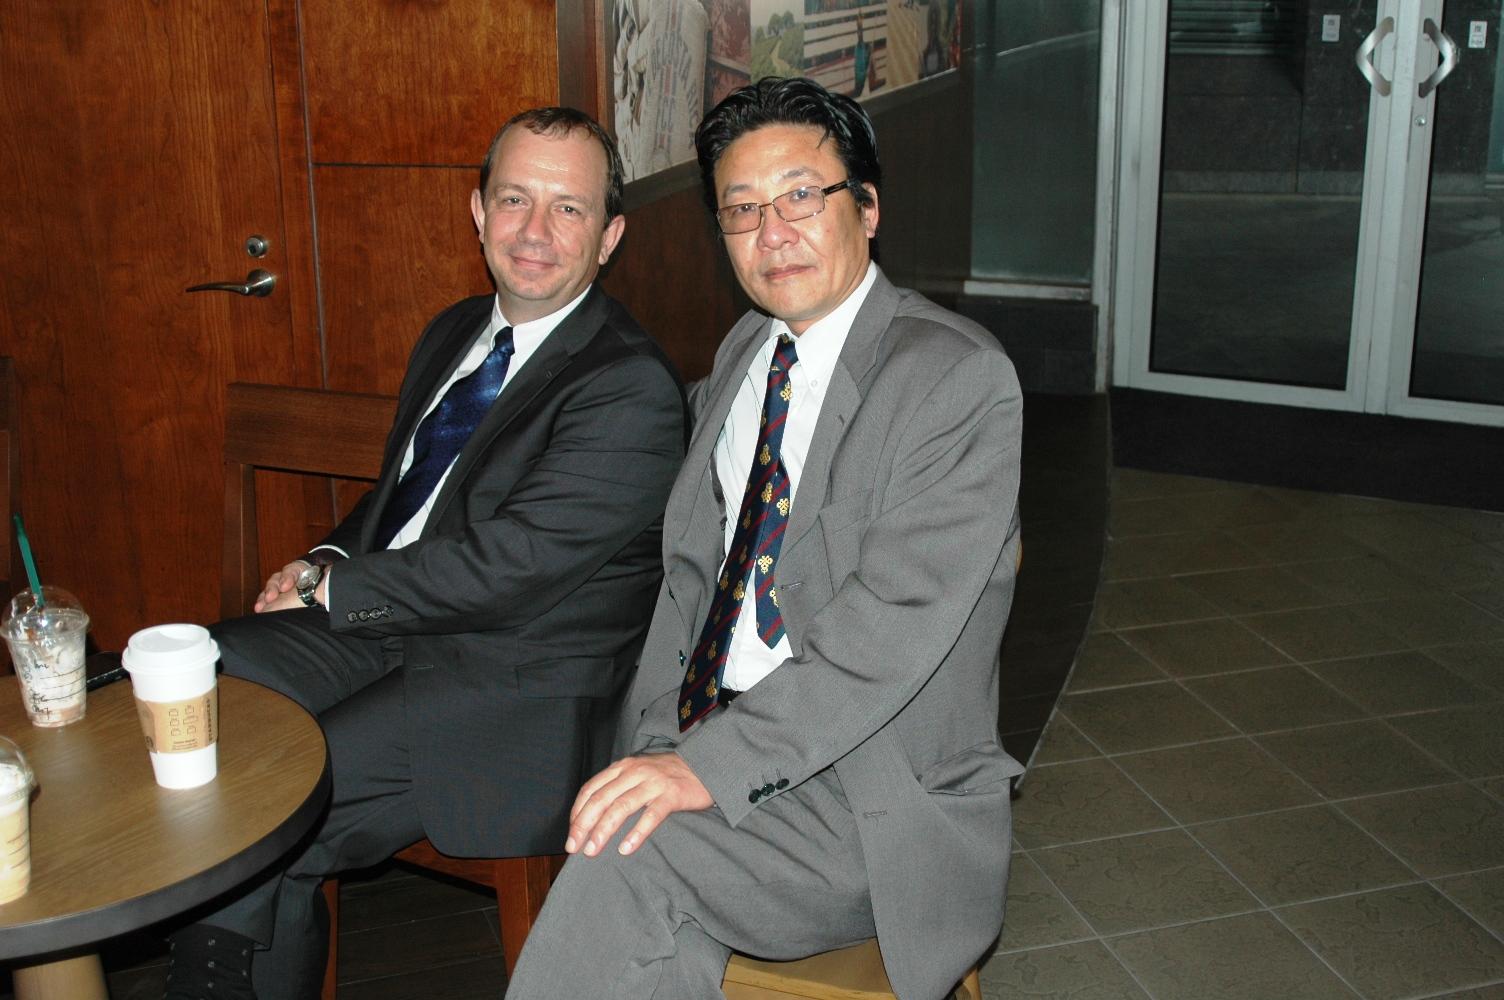 Victoria市长 Mr. Dean Fortin 2012年10月访问苏州